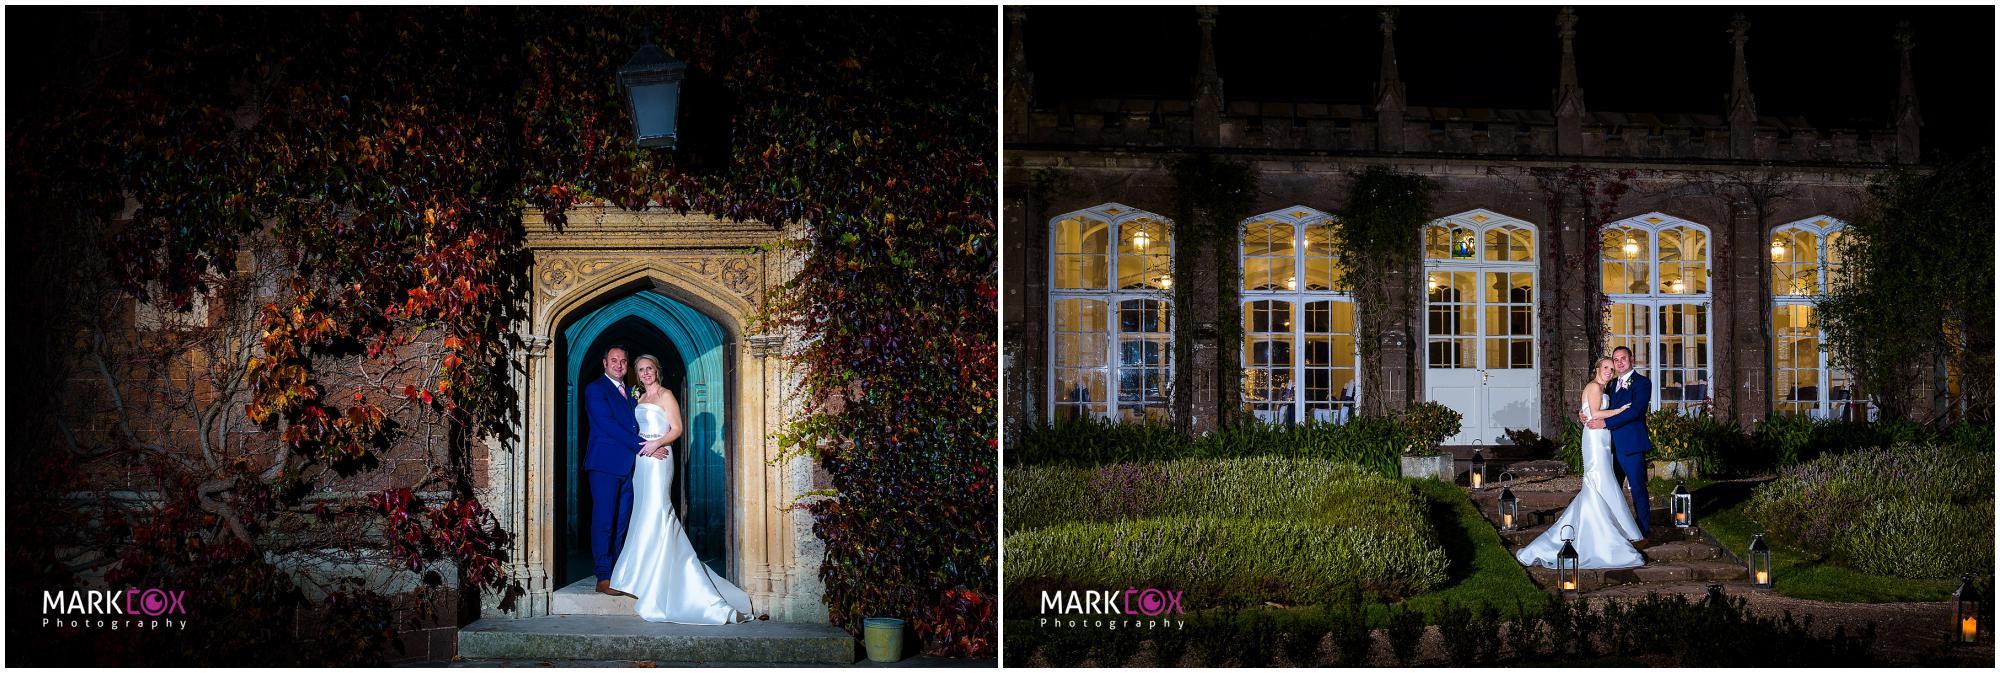 St Audries Park Wedding Photographer - Somerset Wedding Photographer-012